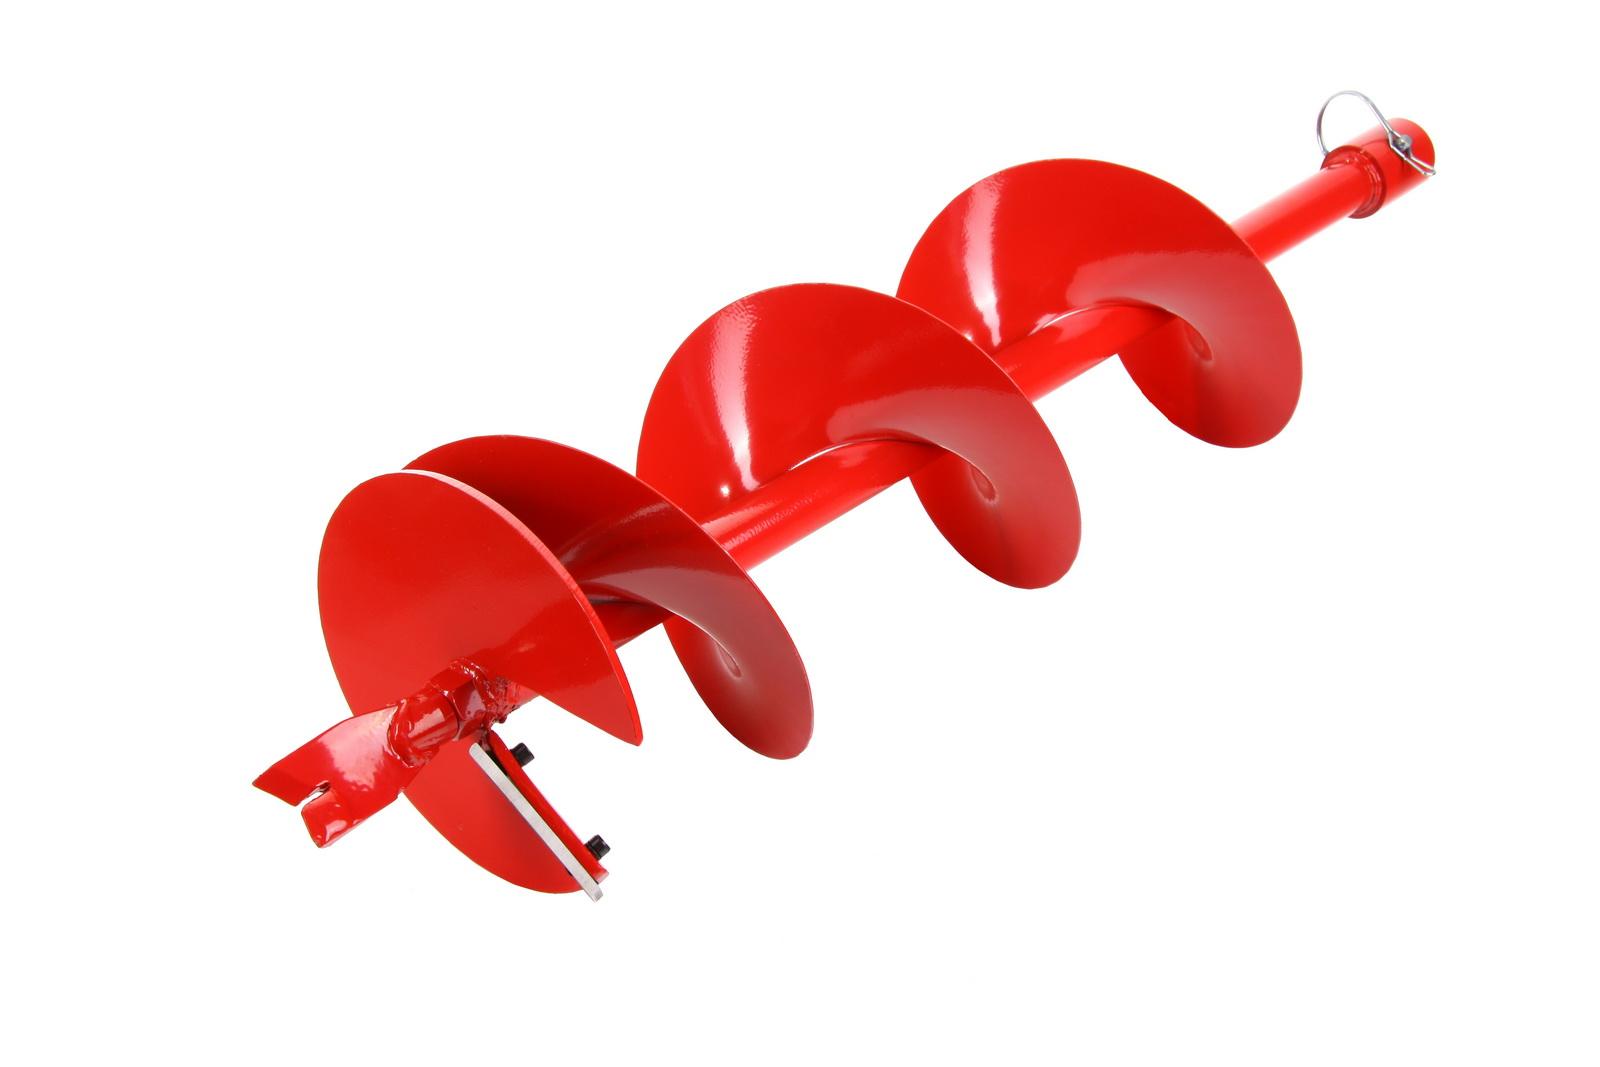 Шнек Hammer для грунта 8'' (200мм)